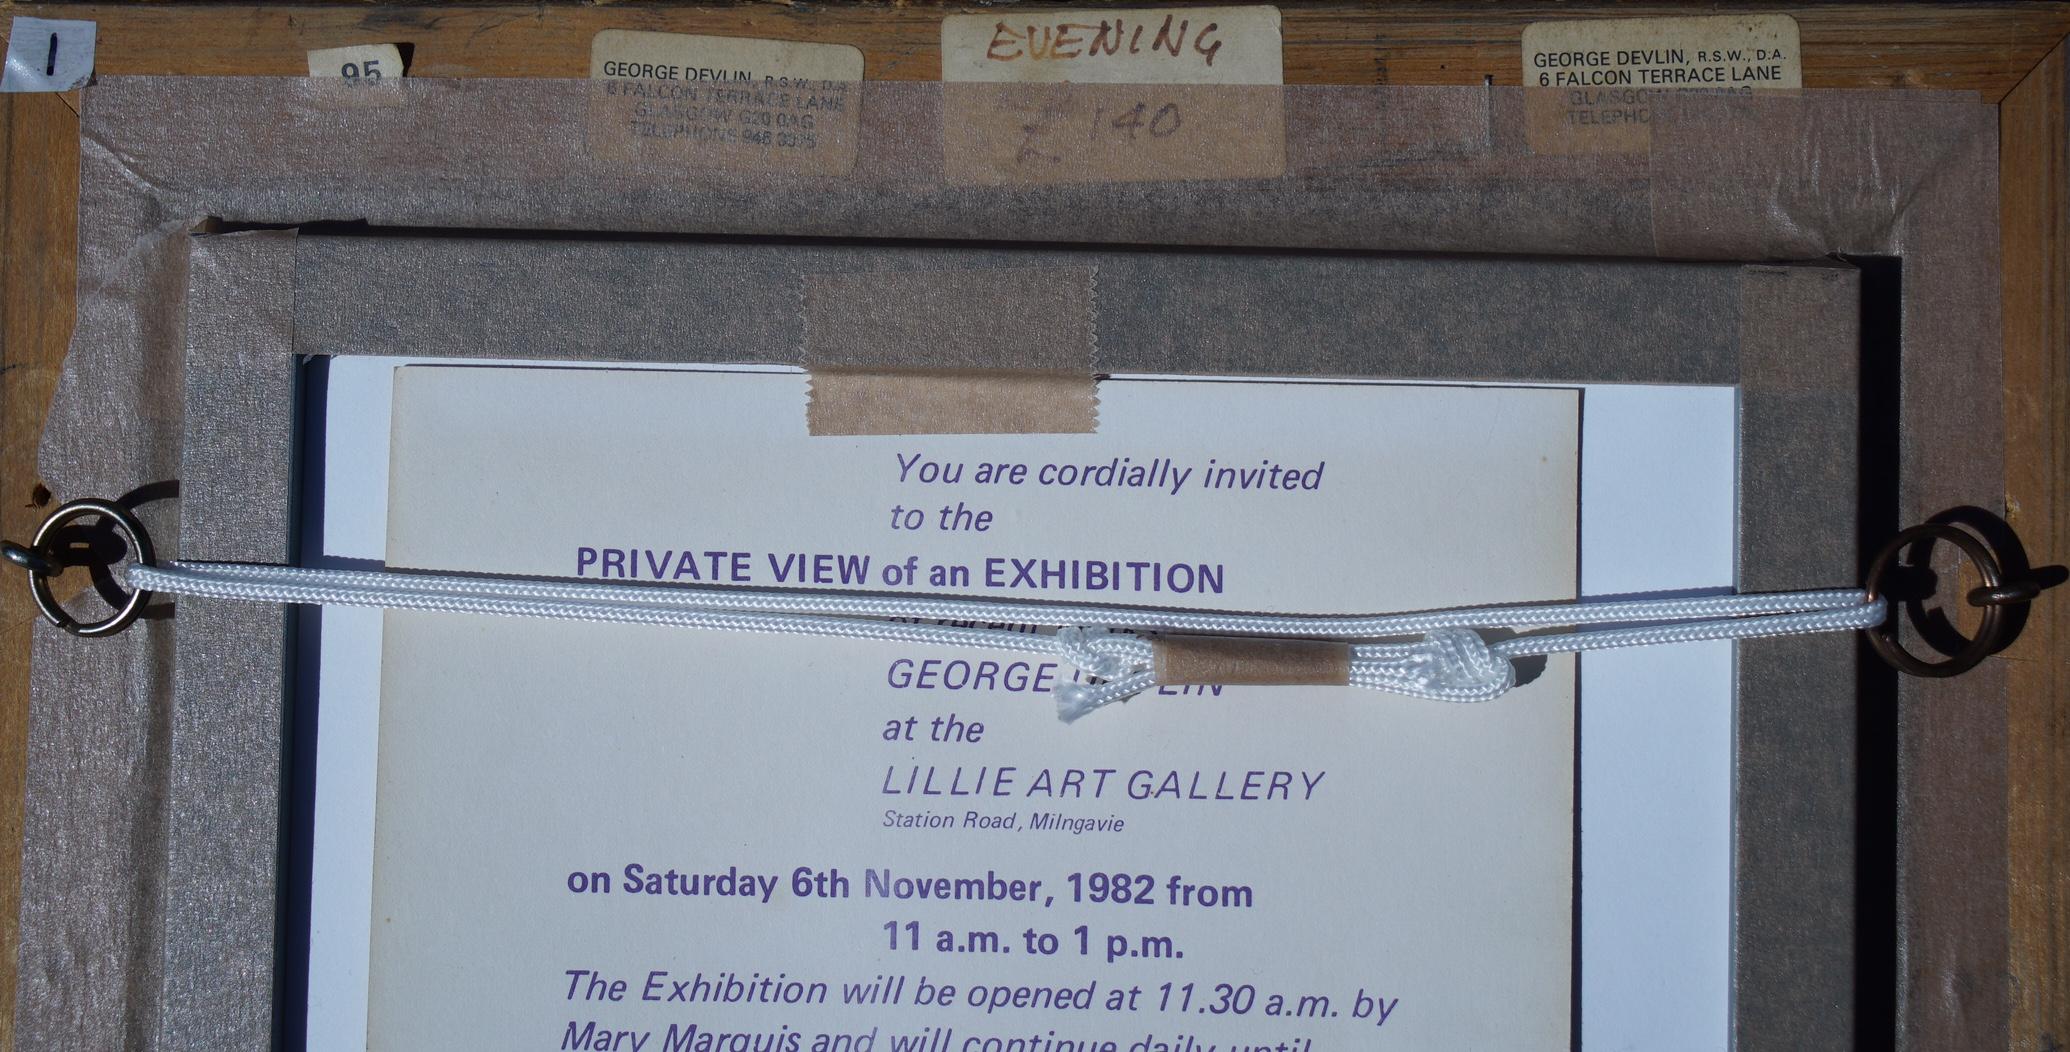 GEORGE DEVLIN RSW RGI FRSA (SCOTTISH 1937 - 2014), Evening, Signed Oil Painting - Image 2 of 2